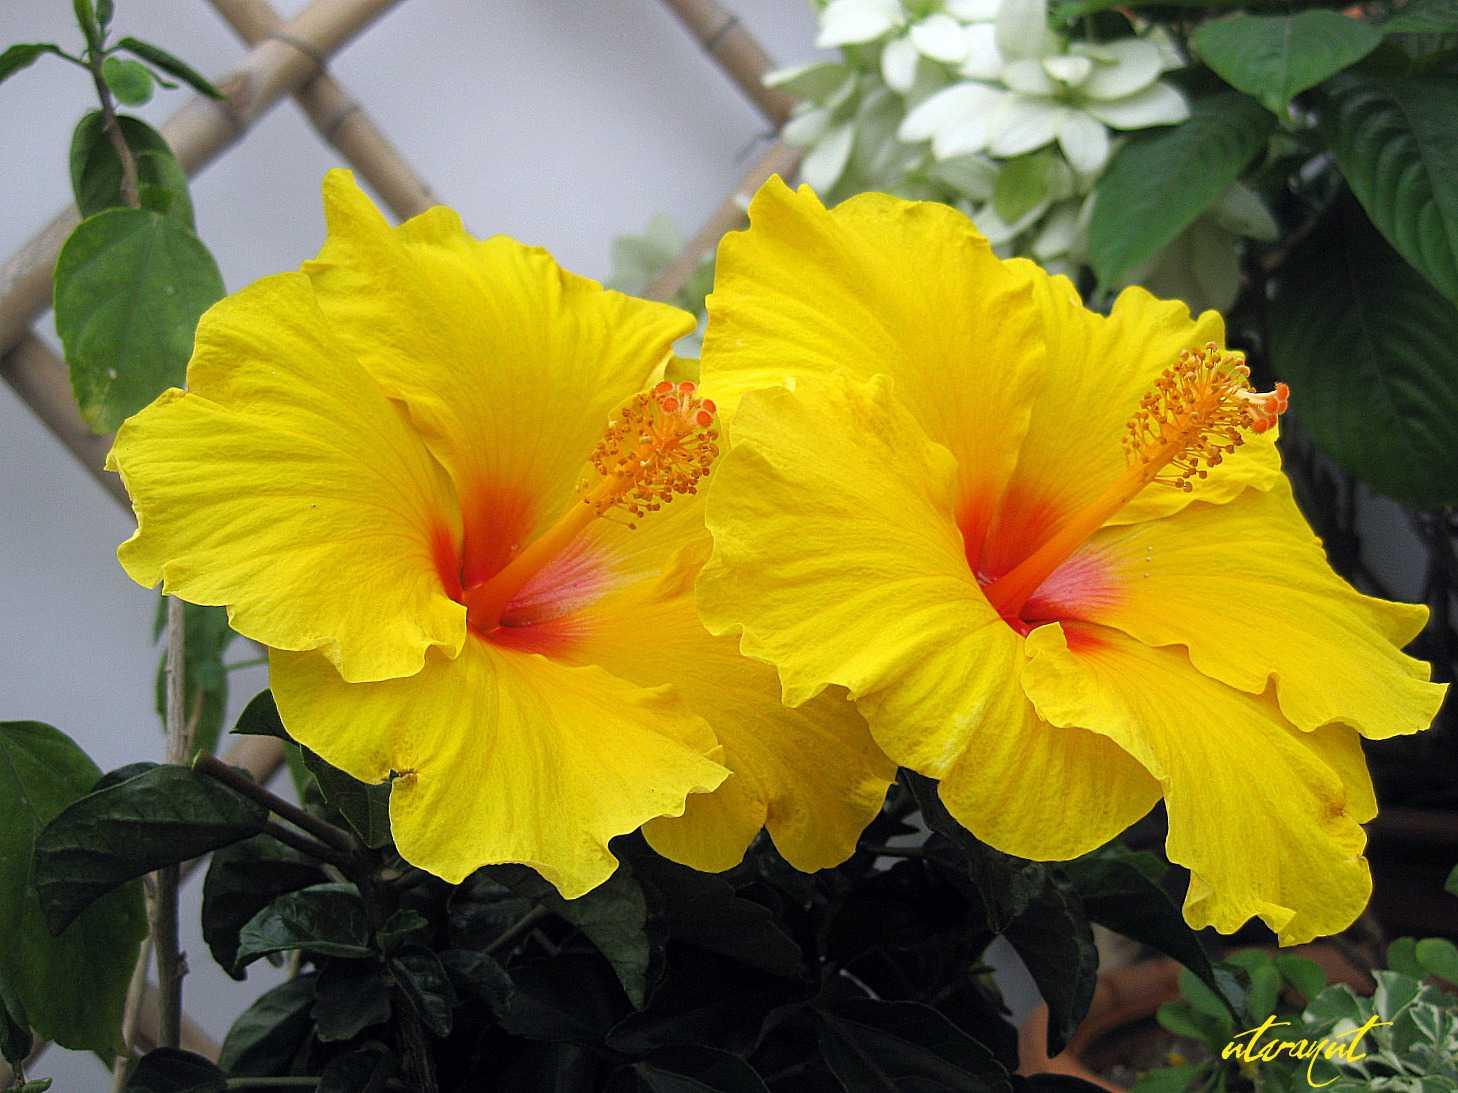 cây hoa phong thủy 5